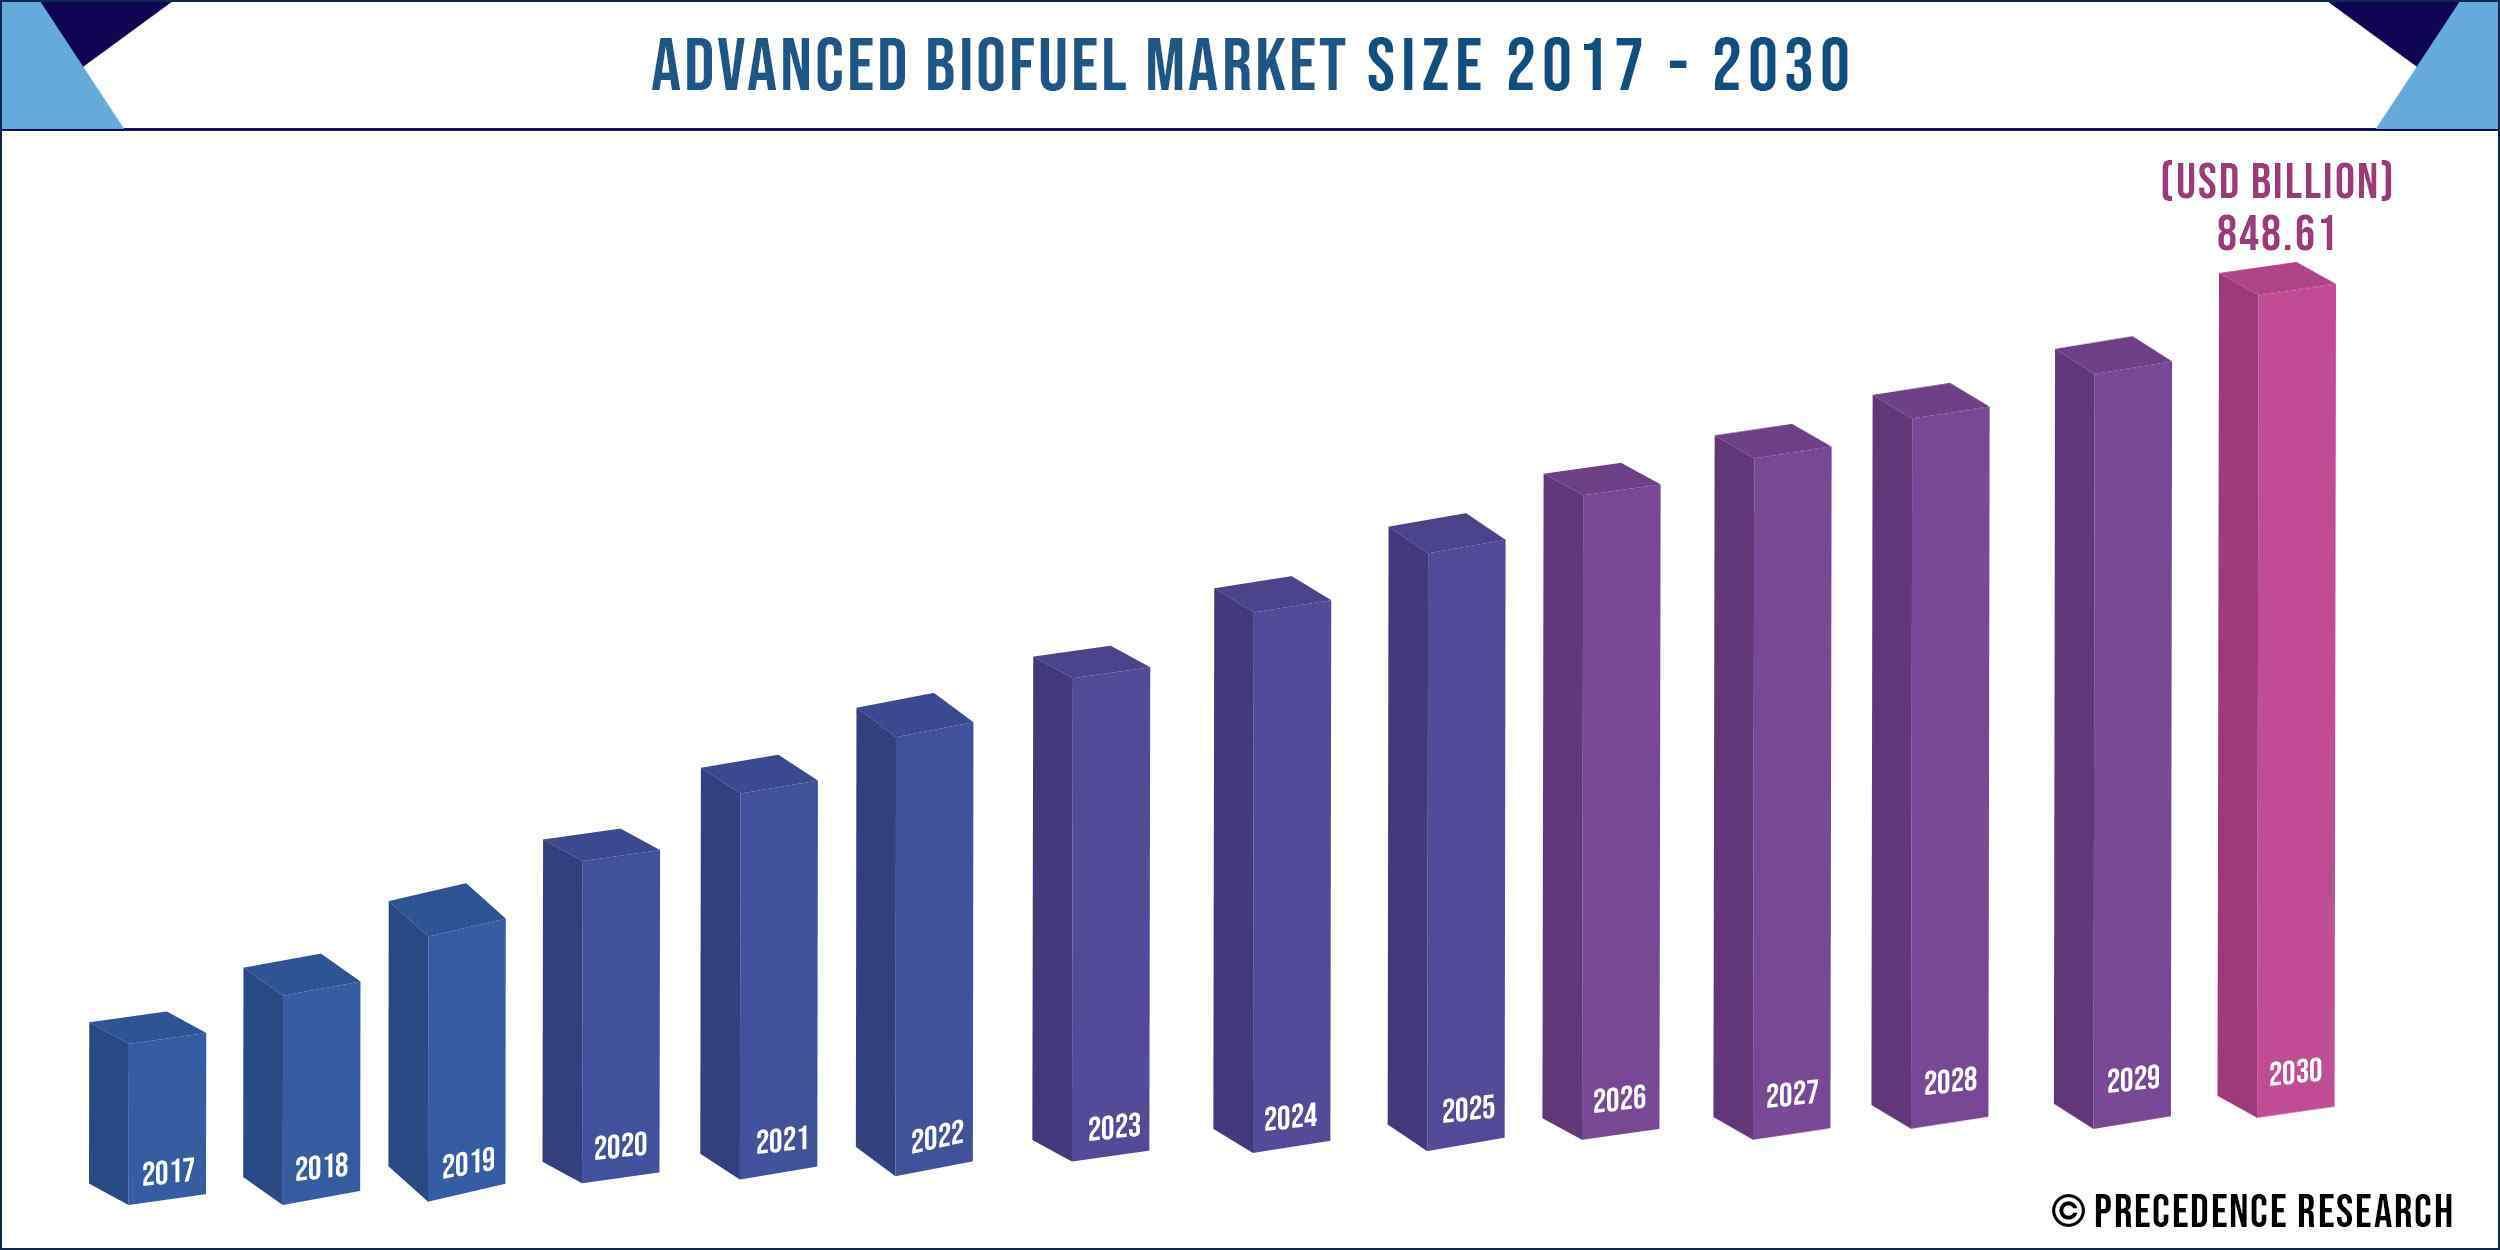 Advanced Biofuels Market Size 2017-2030